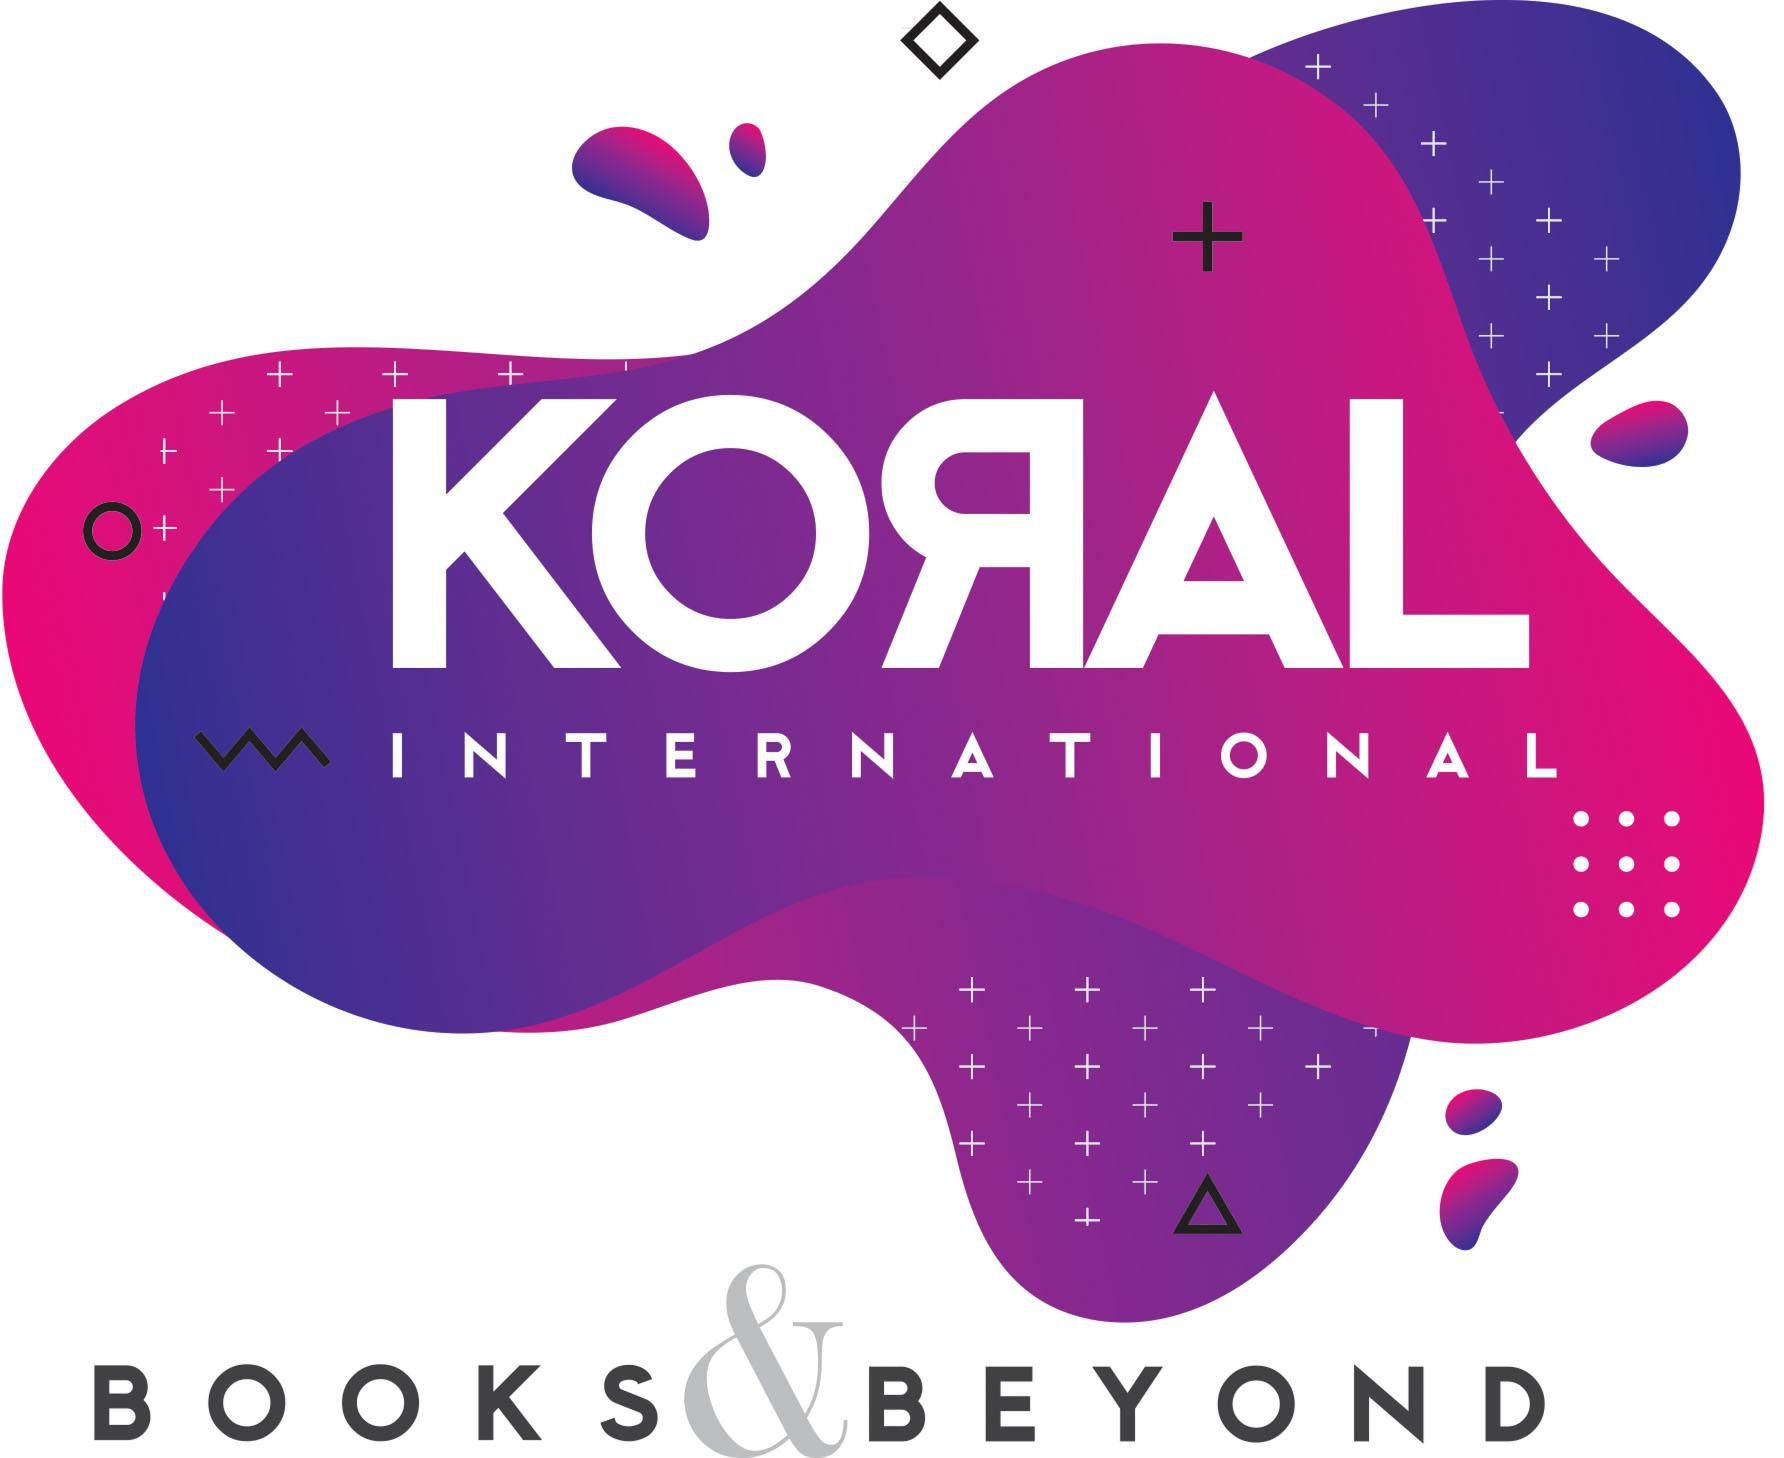 Koral Books